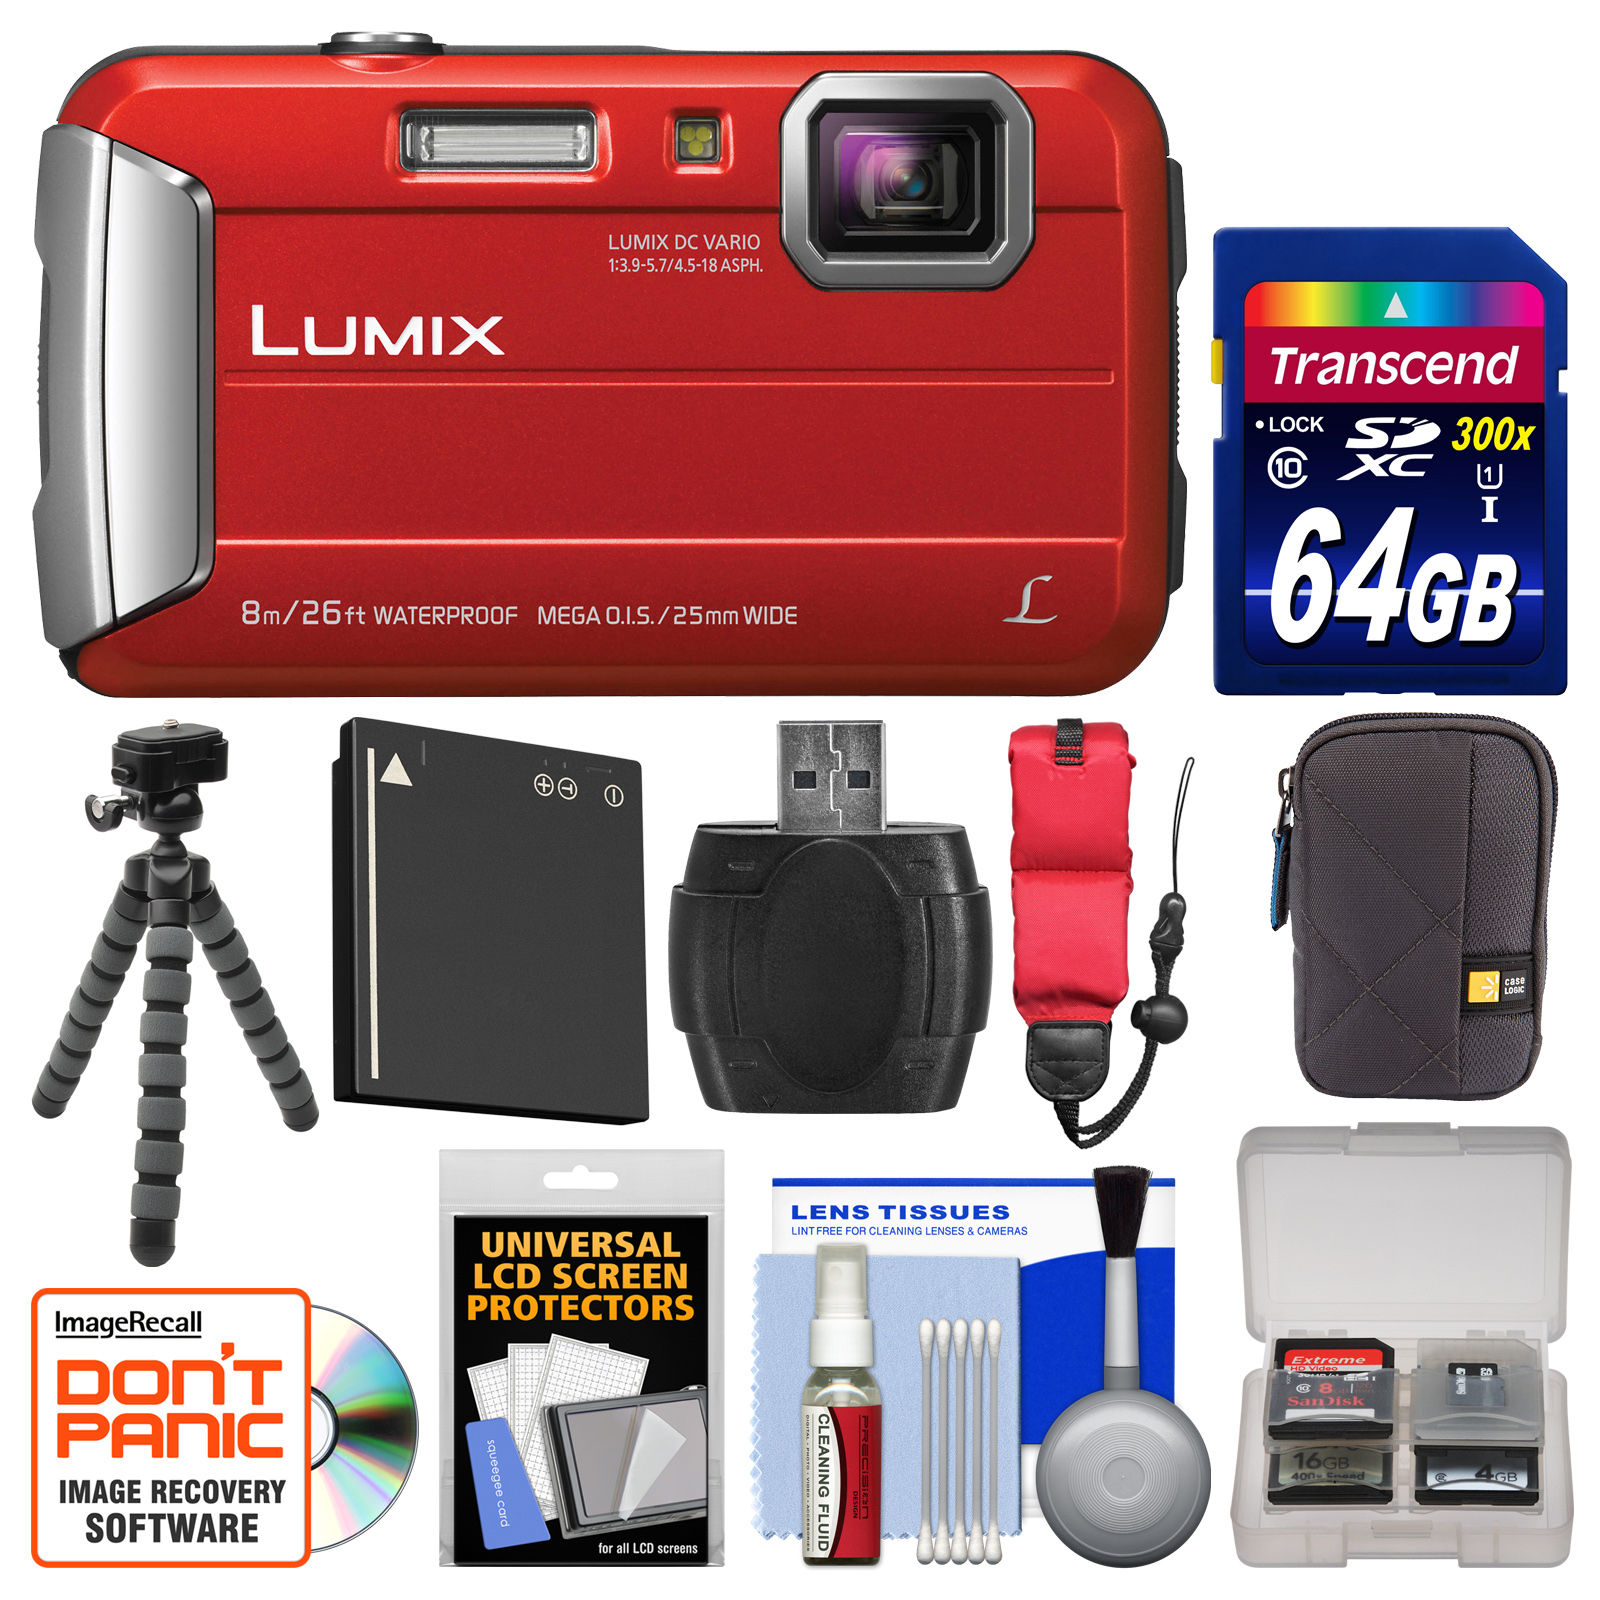 Panasonic Lumix DMC-TS30 Tough Shock & Waterproof Digital Camera (Blue) with 64GB Card + Case + Battery + Flex Tripod + Float Strap + Kit